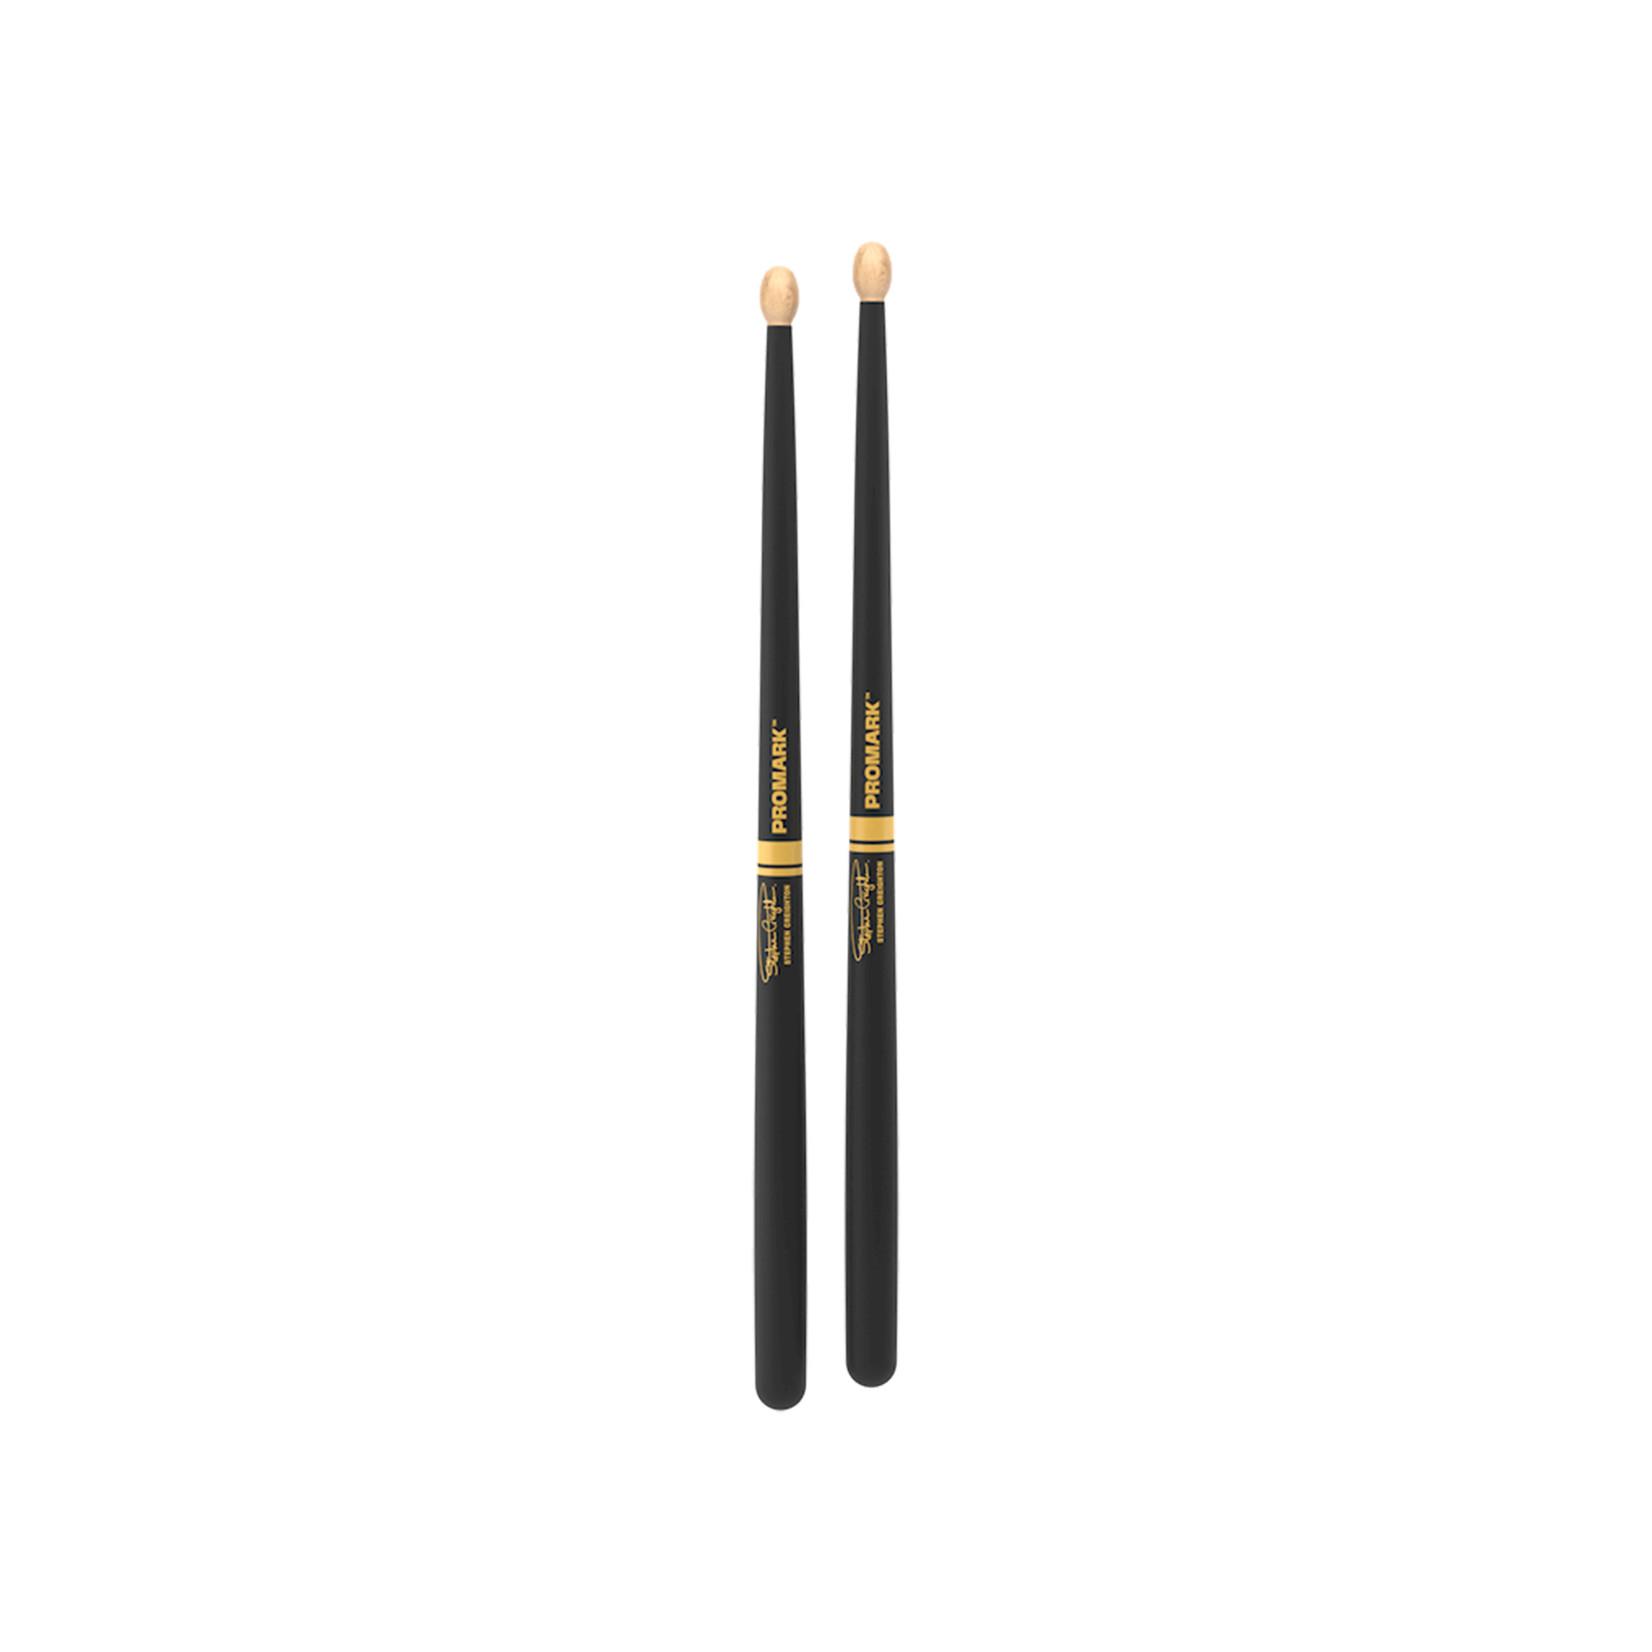 Promark ProMark Stephen Creighton 2000, Activegrip Maple Wood Tip Drumstick